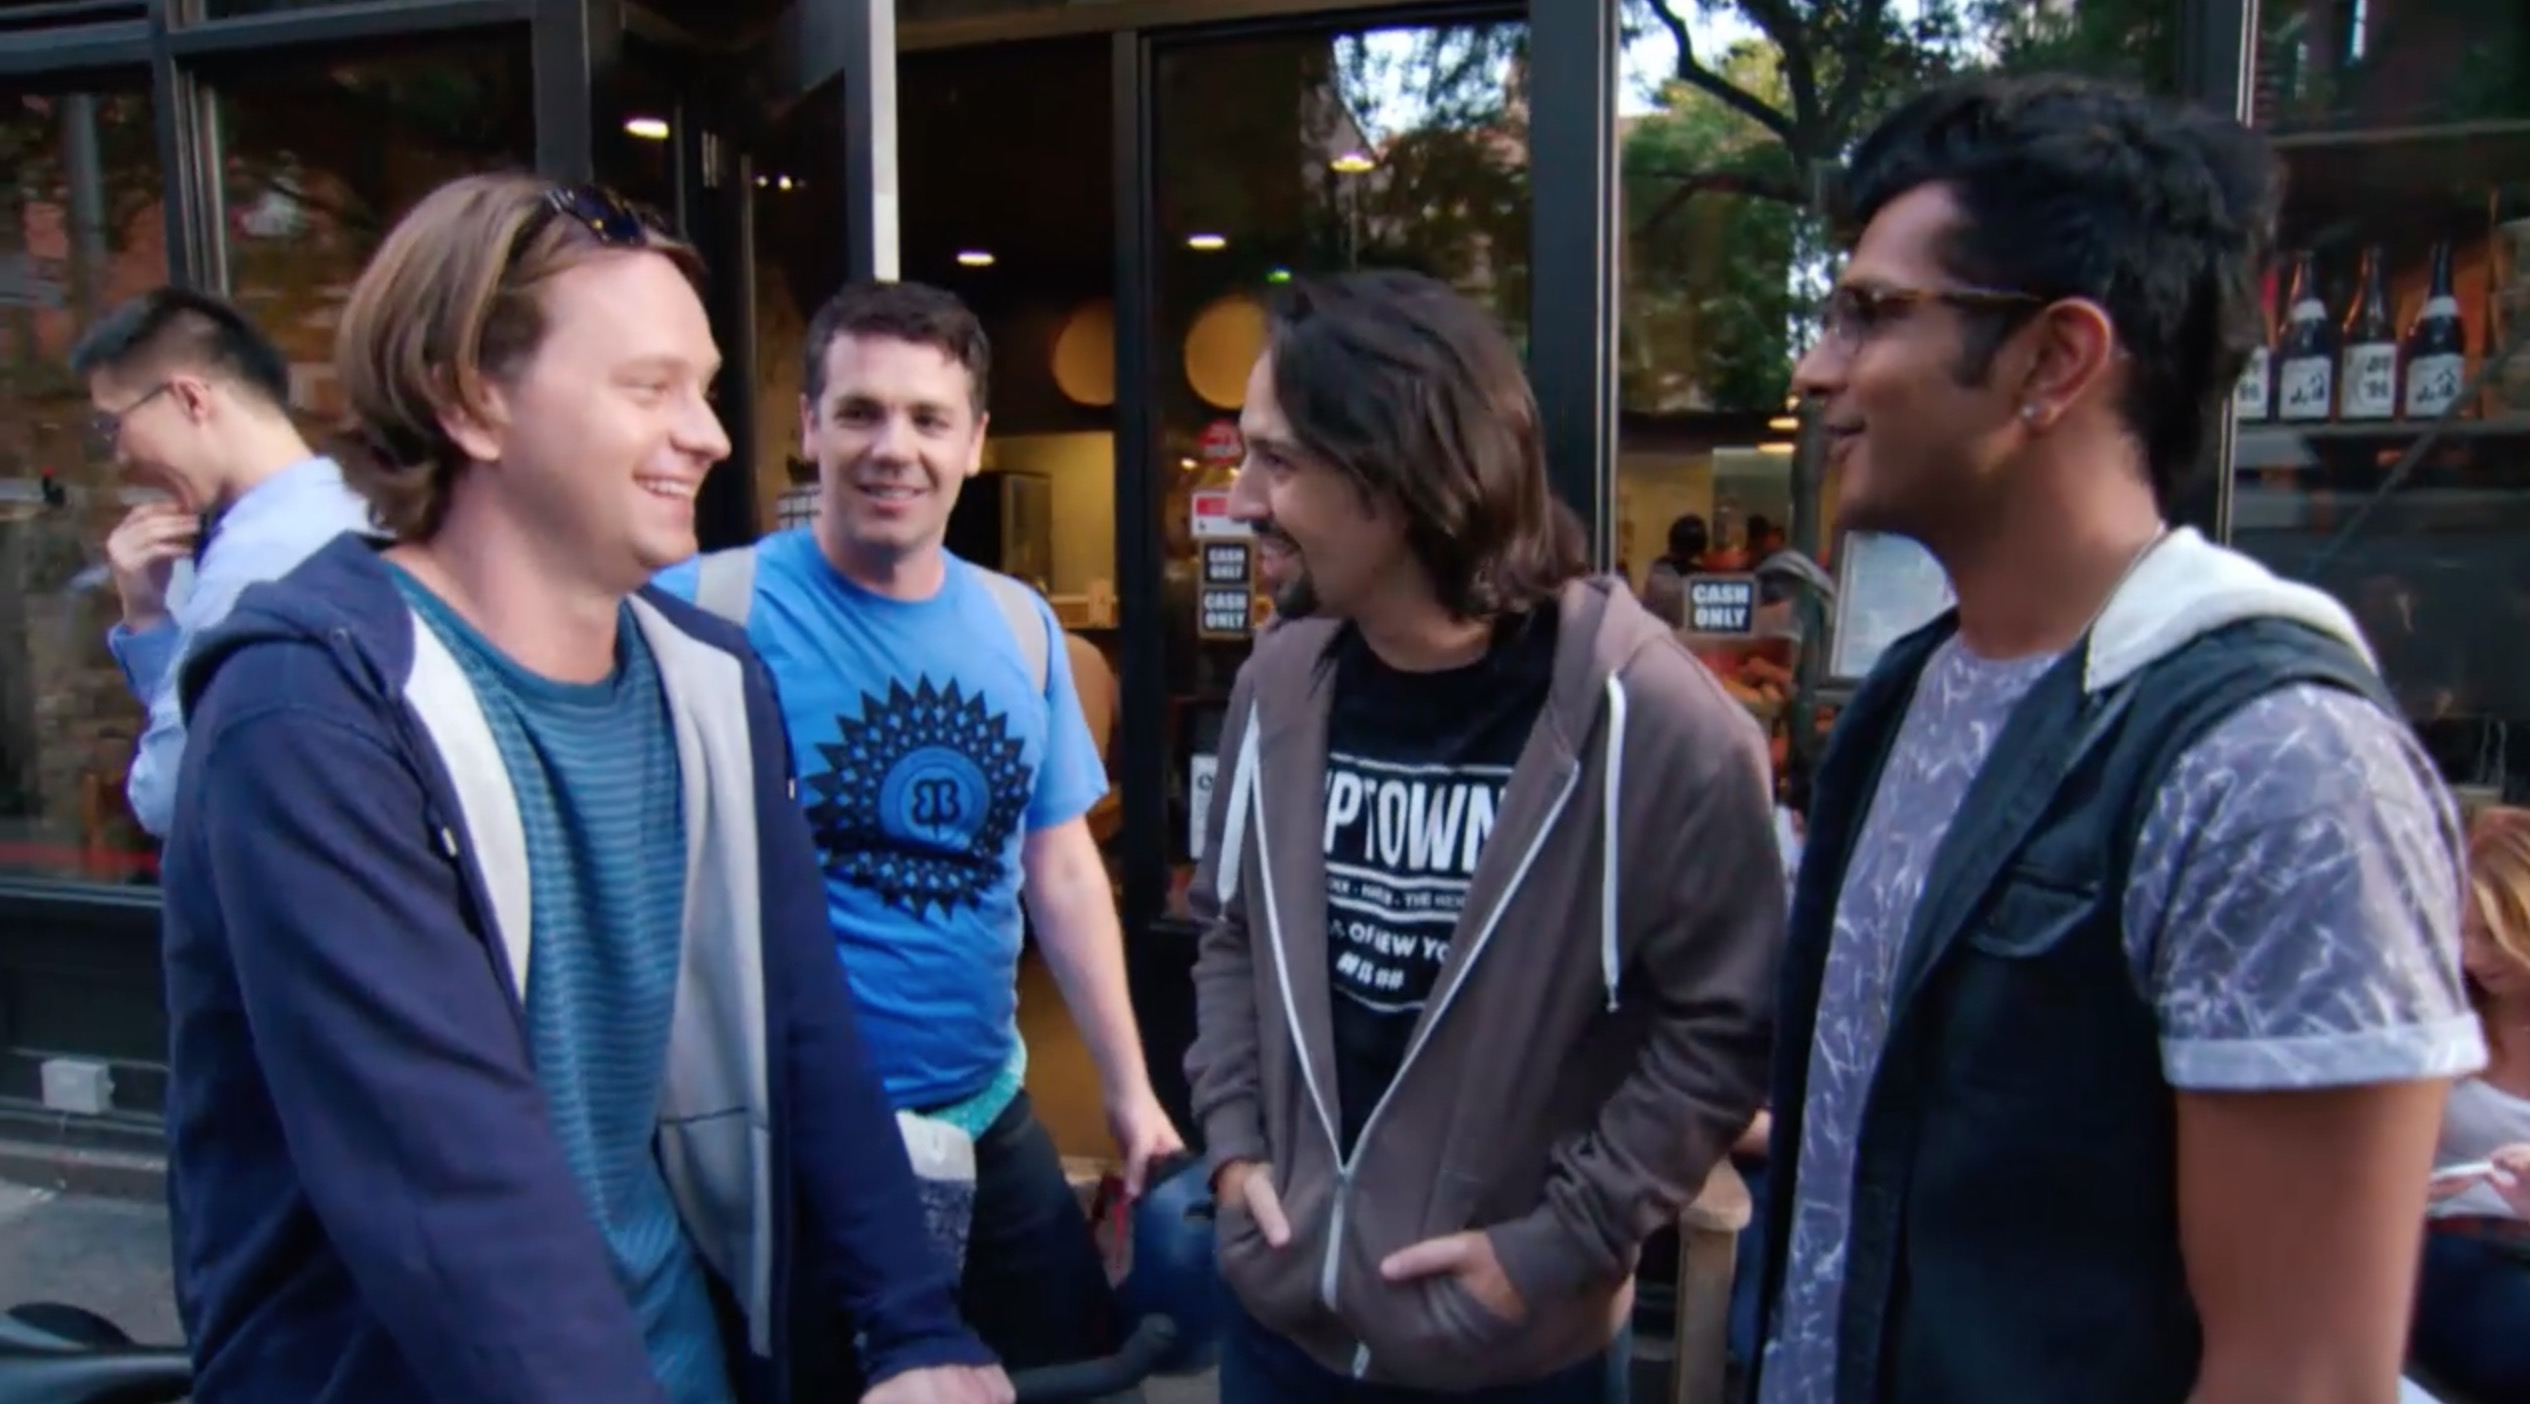 BWW TV Exclusive: Watch Lin-Manuel Miranda & Company in the Premiere Episode of Seeso's FREESTYLE LOVE SUPREME!